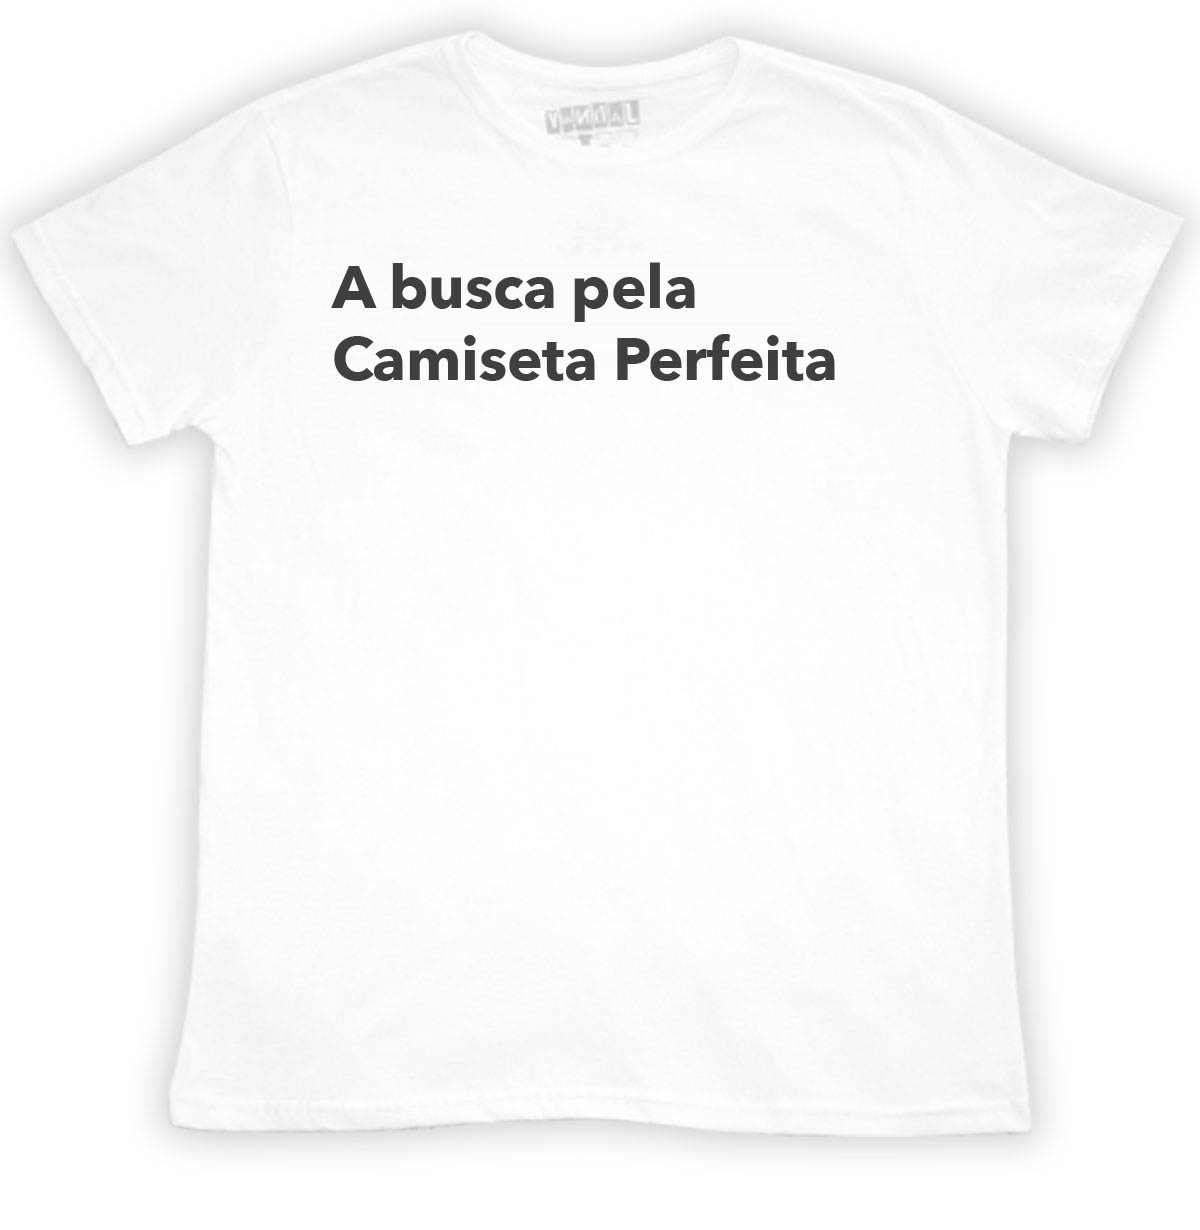 Vandal camiseta perfeita2